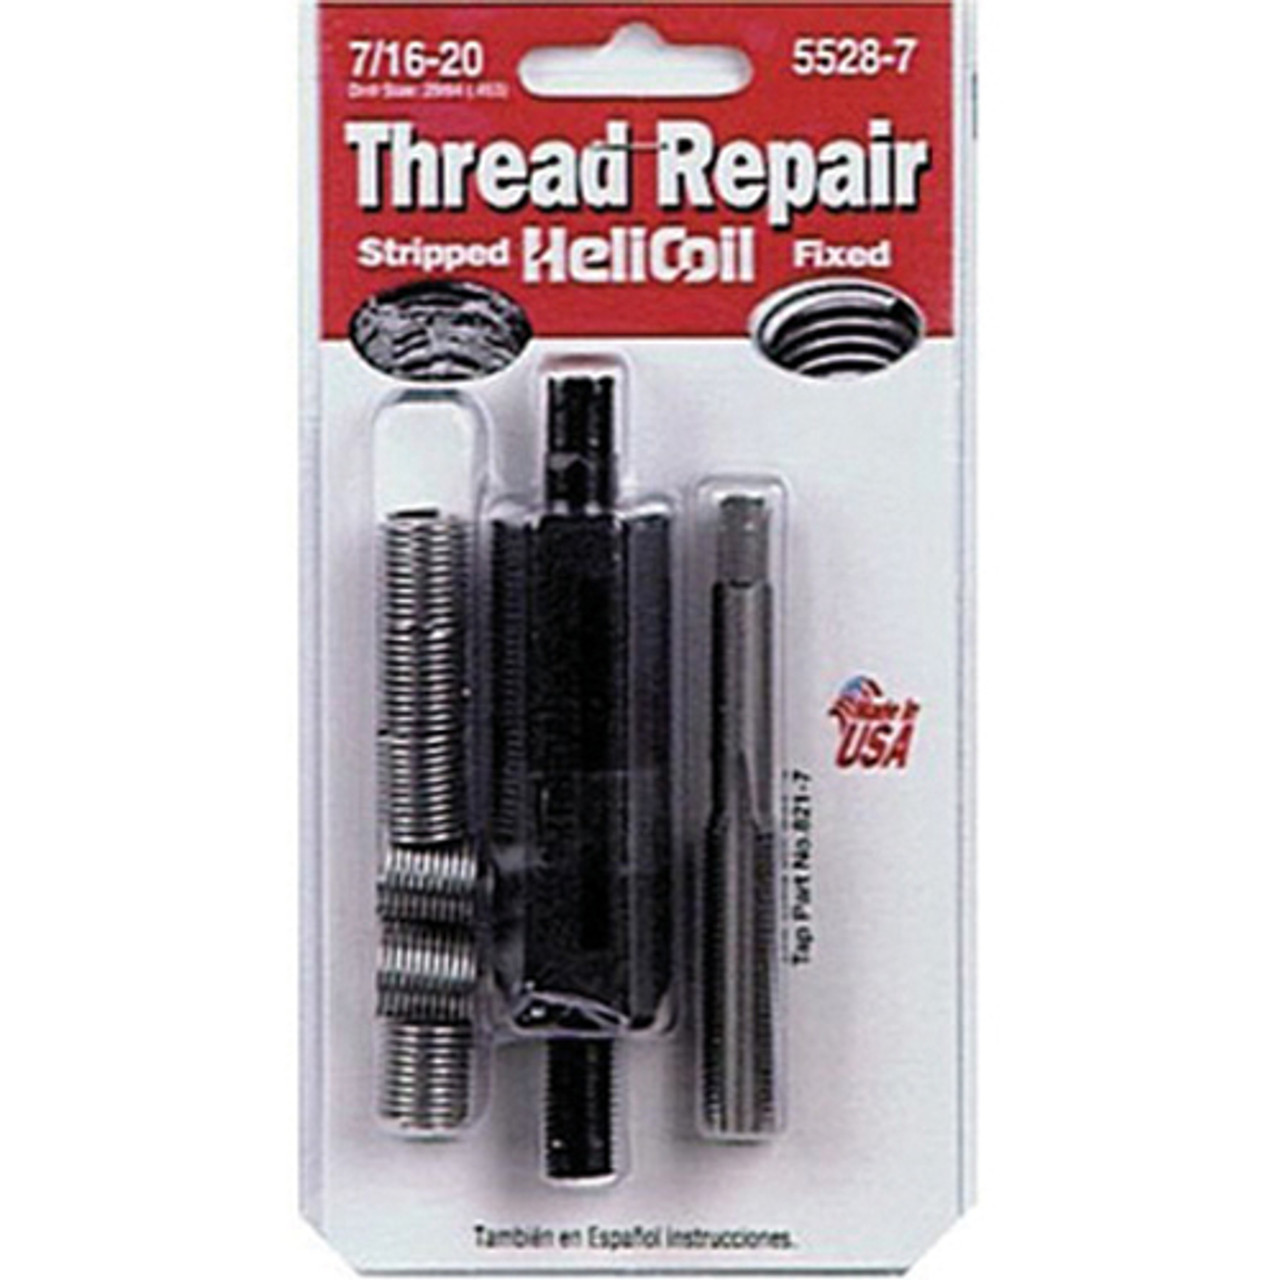 Helicoil 5528-7 Thread Repair Kit, 7/16